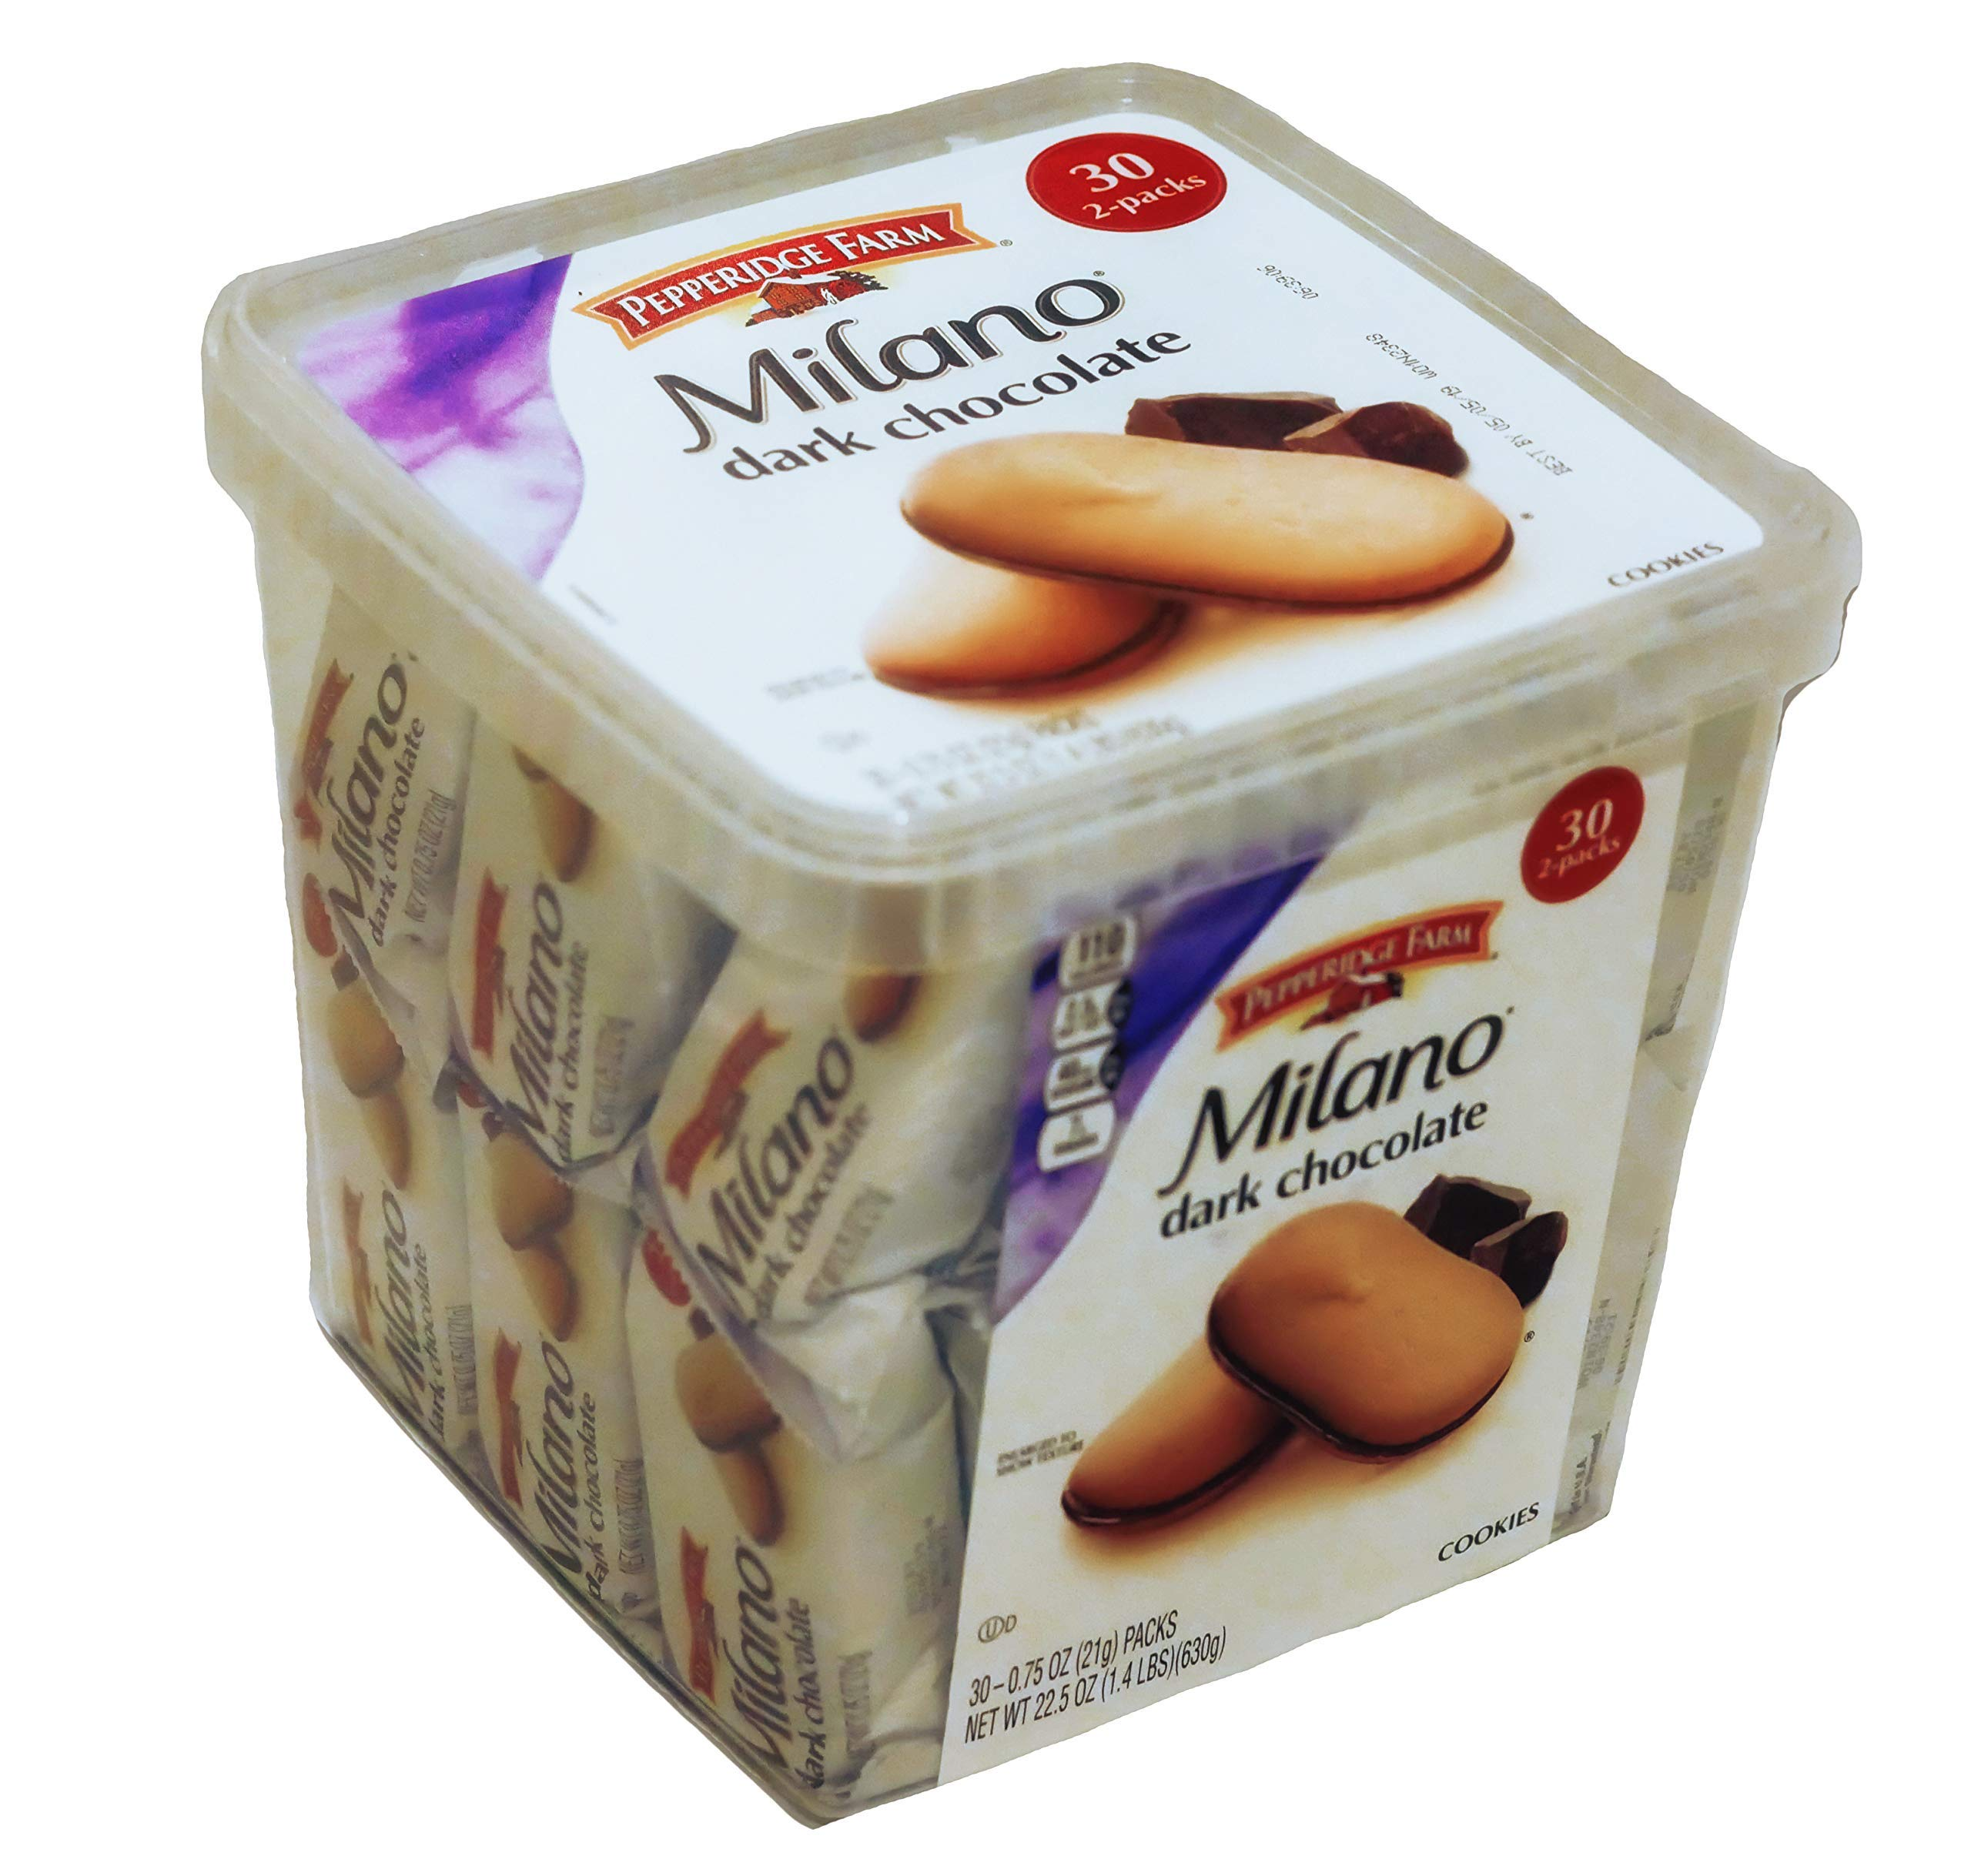 Pepperidge Farm, Milano, Cookies, Dark Chocolate, 22.5 oz, Multi-pack, Tub, 2-packs, 30-count